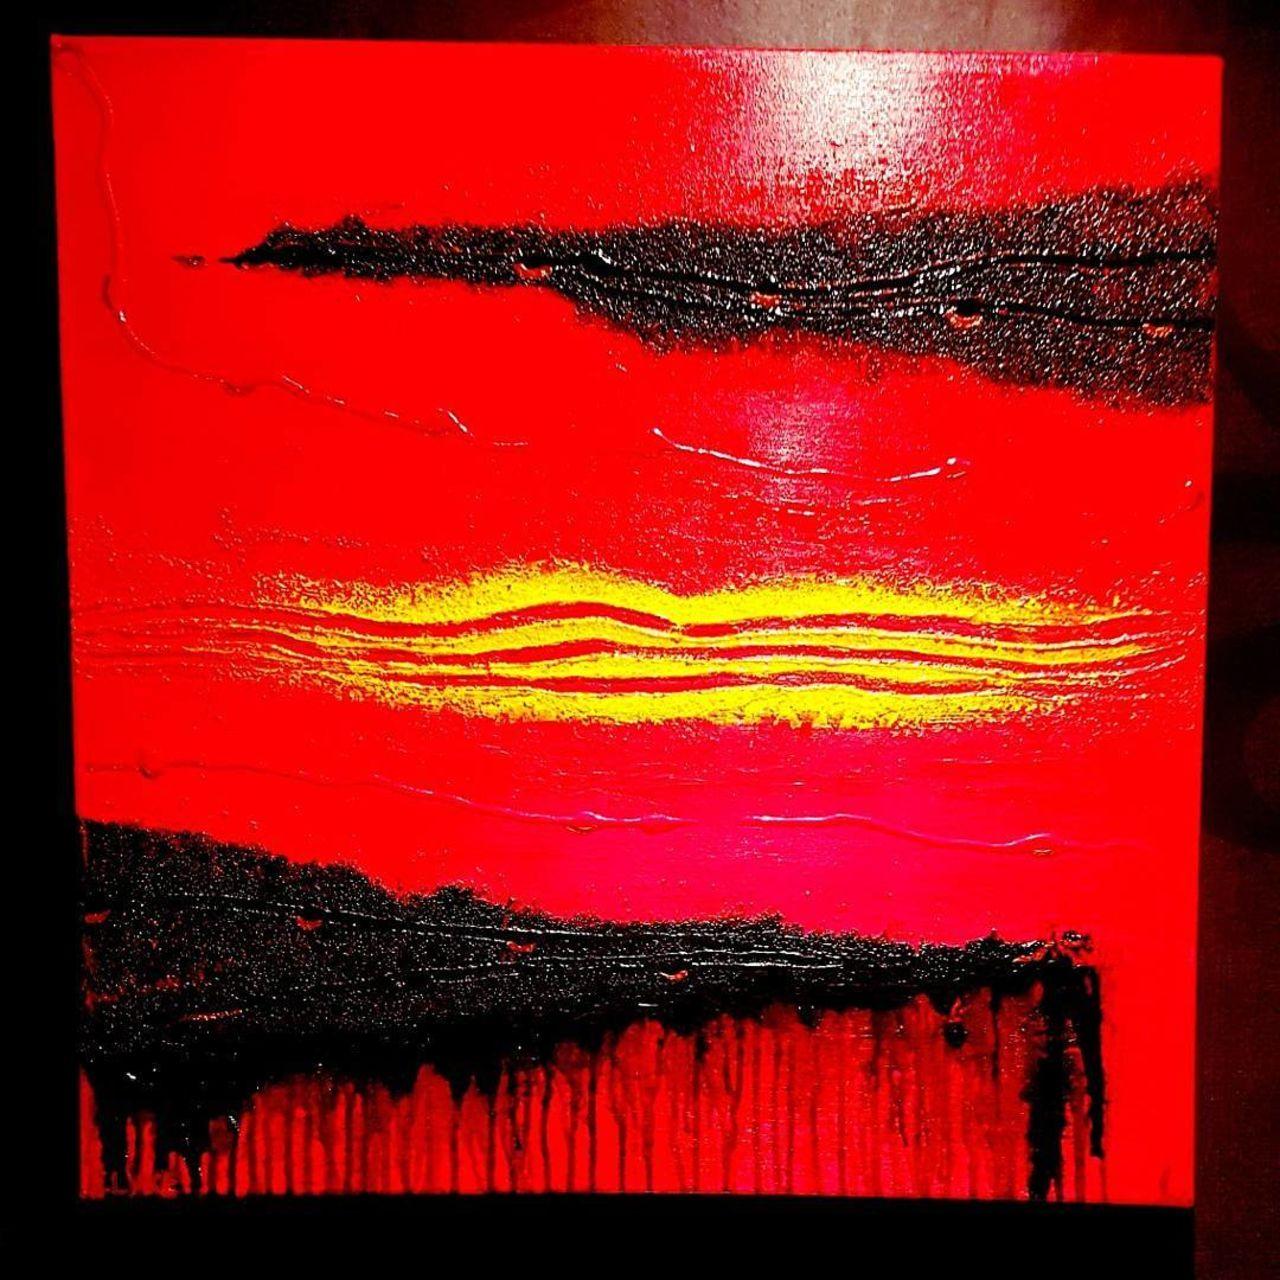 Art by Eva-Lotta Olsson Red island